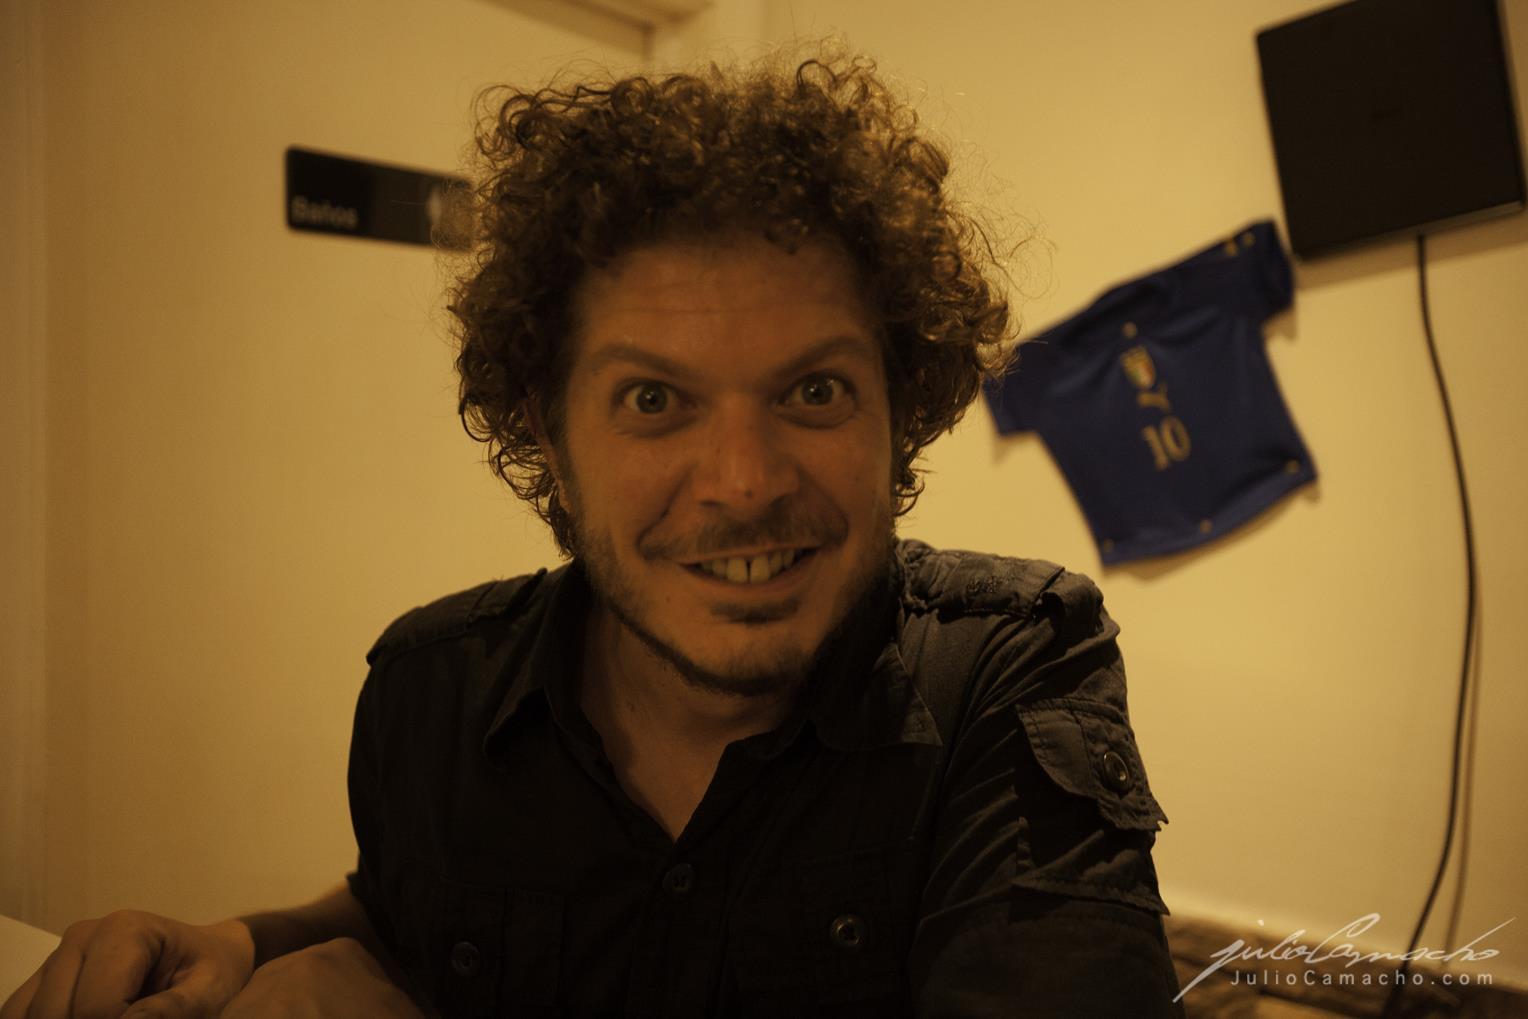 2014-10-30 31 CAST TOUR Ensenada y Tijuana - 1339 - www.Juli (Copy).jpg